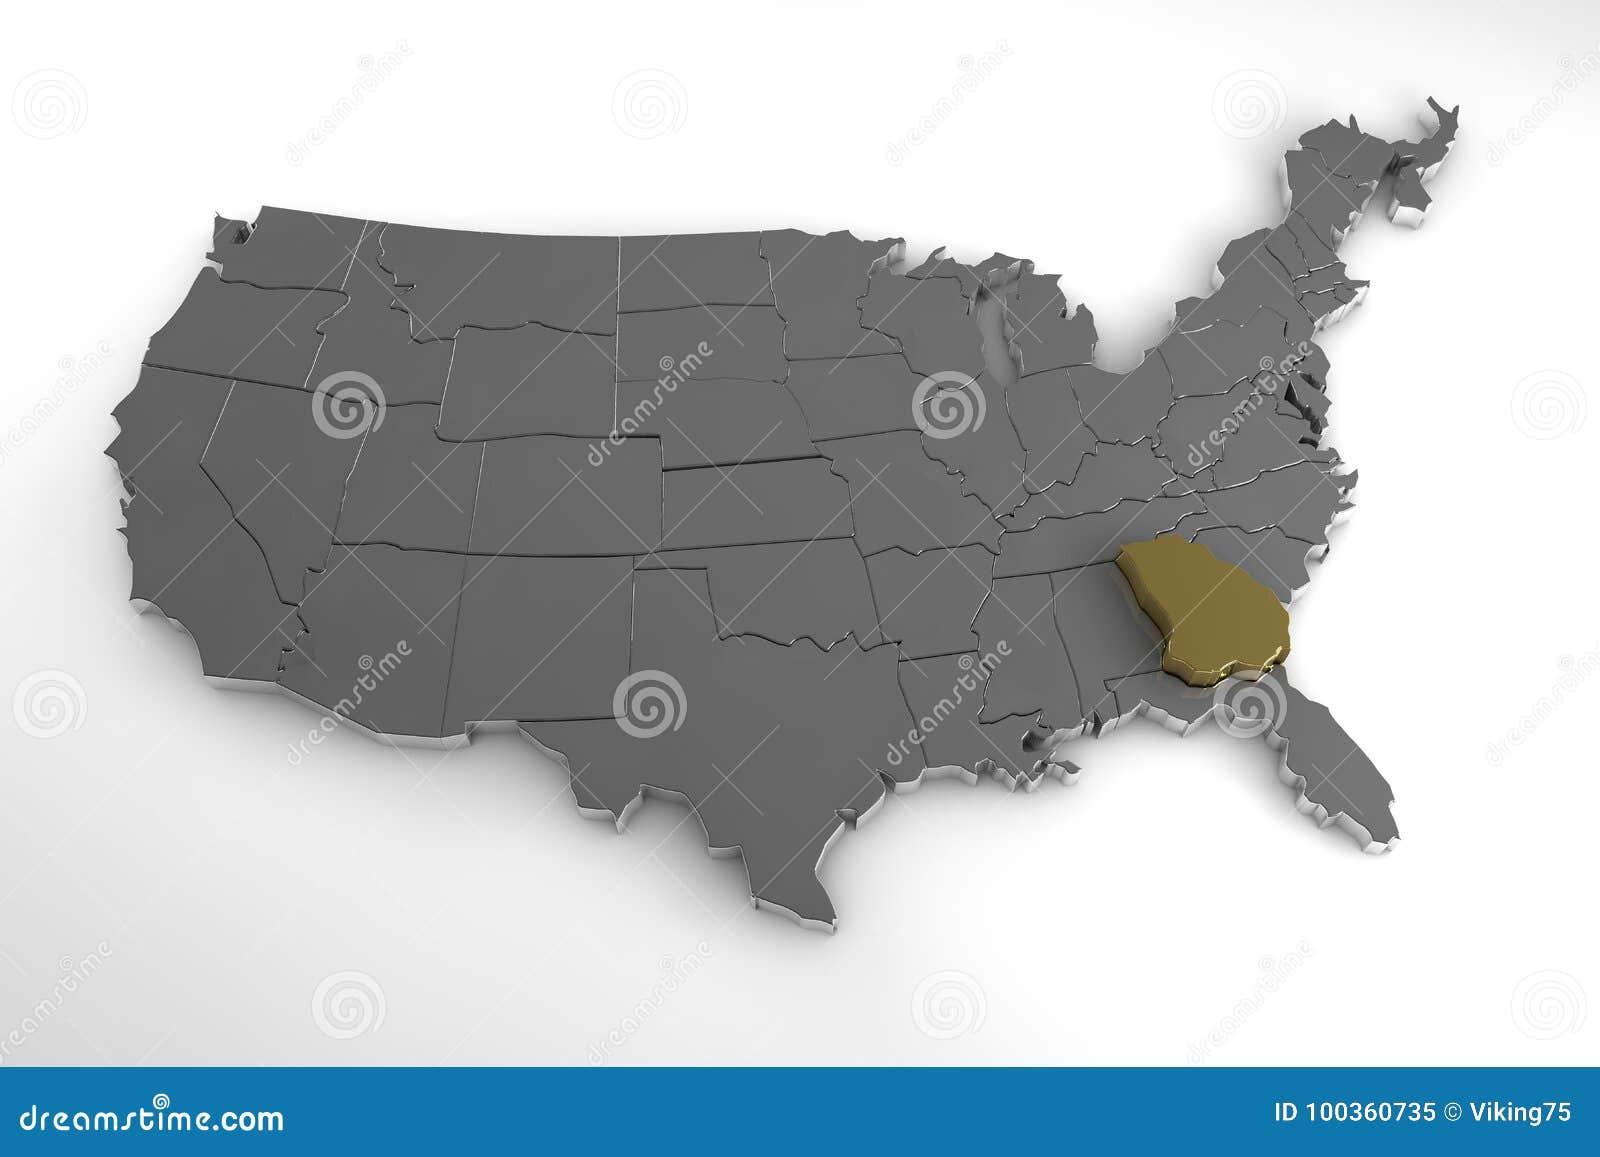 United States Of America 3d Metallic Map With Georgia State - Us-map-georgia-state